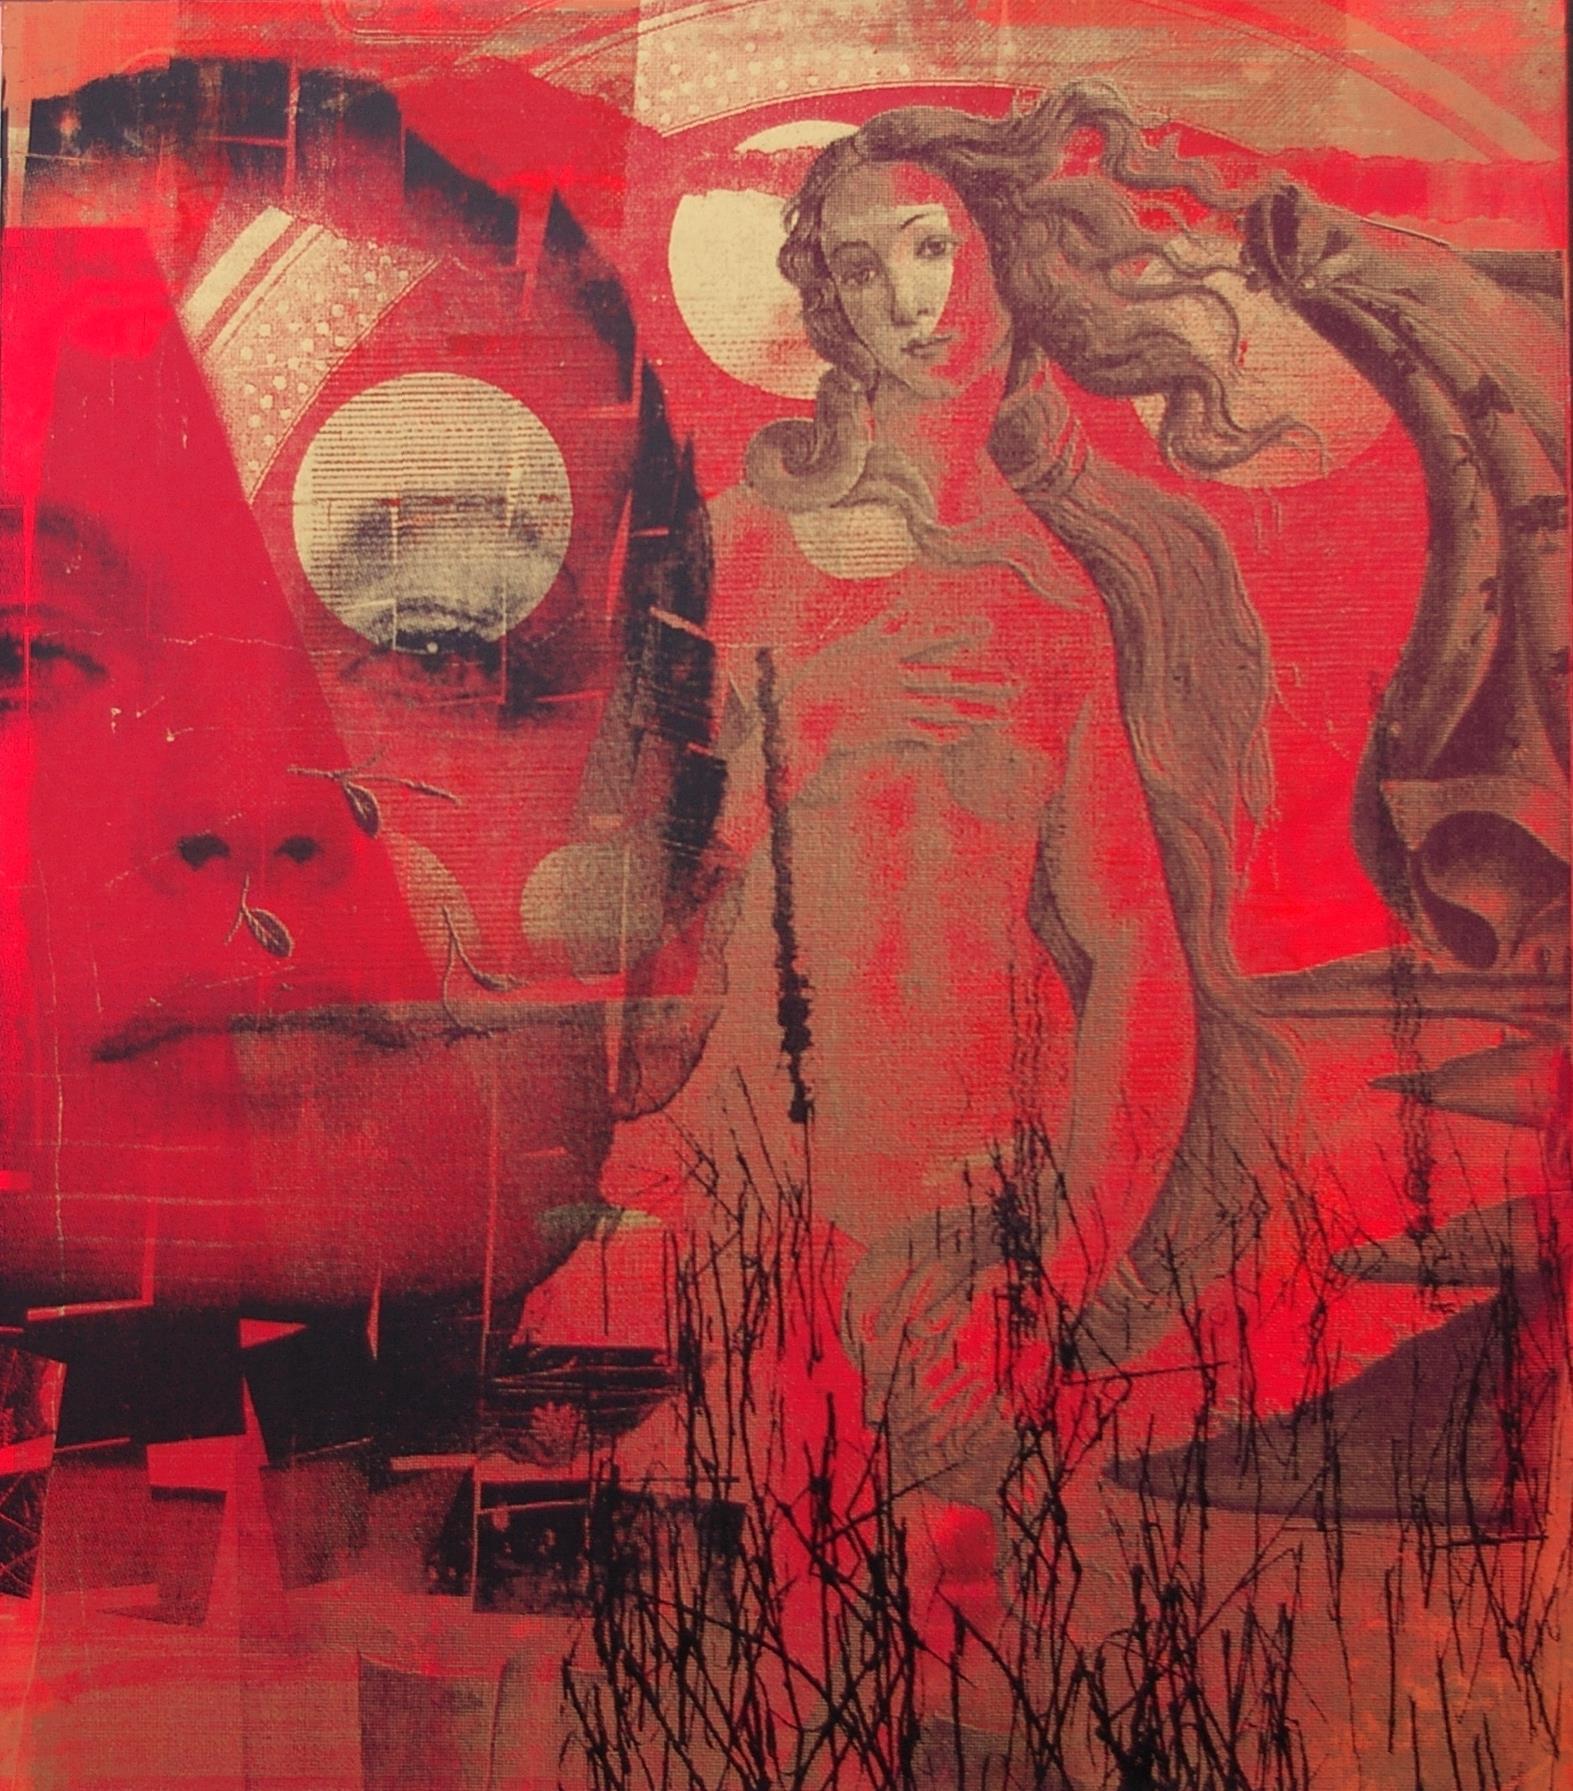 Romy red venus - Reimann, Andreas - k-RH148